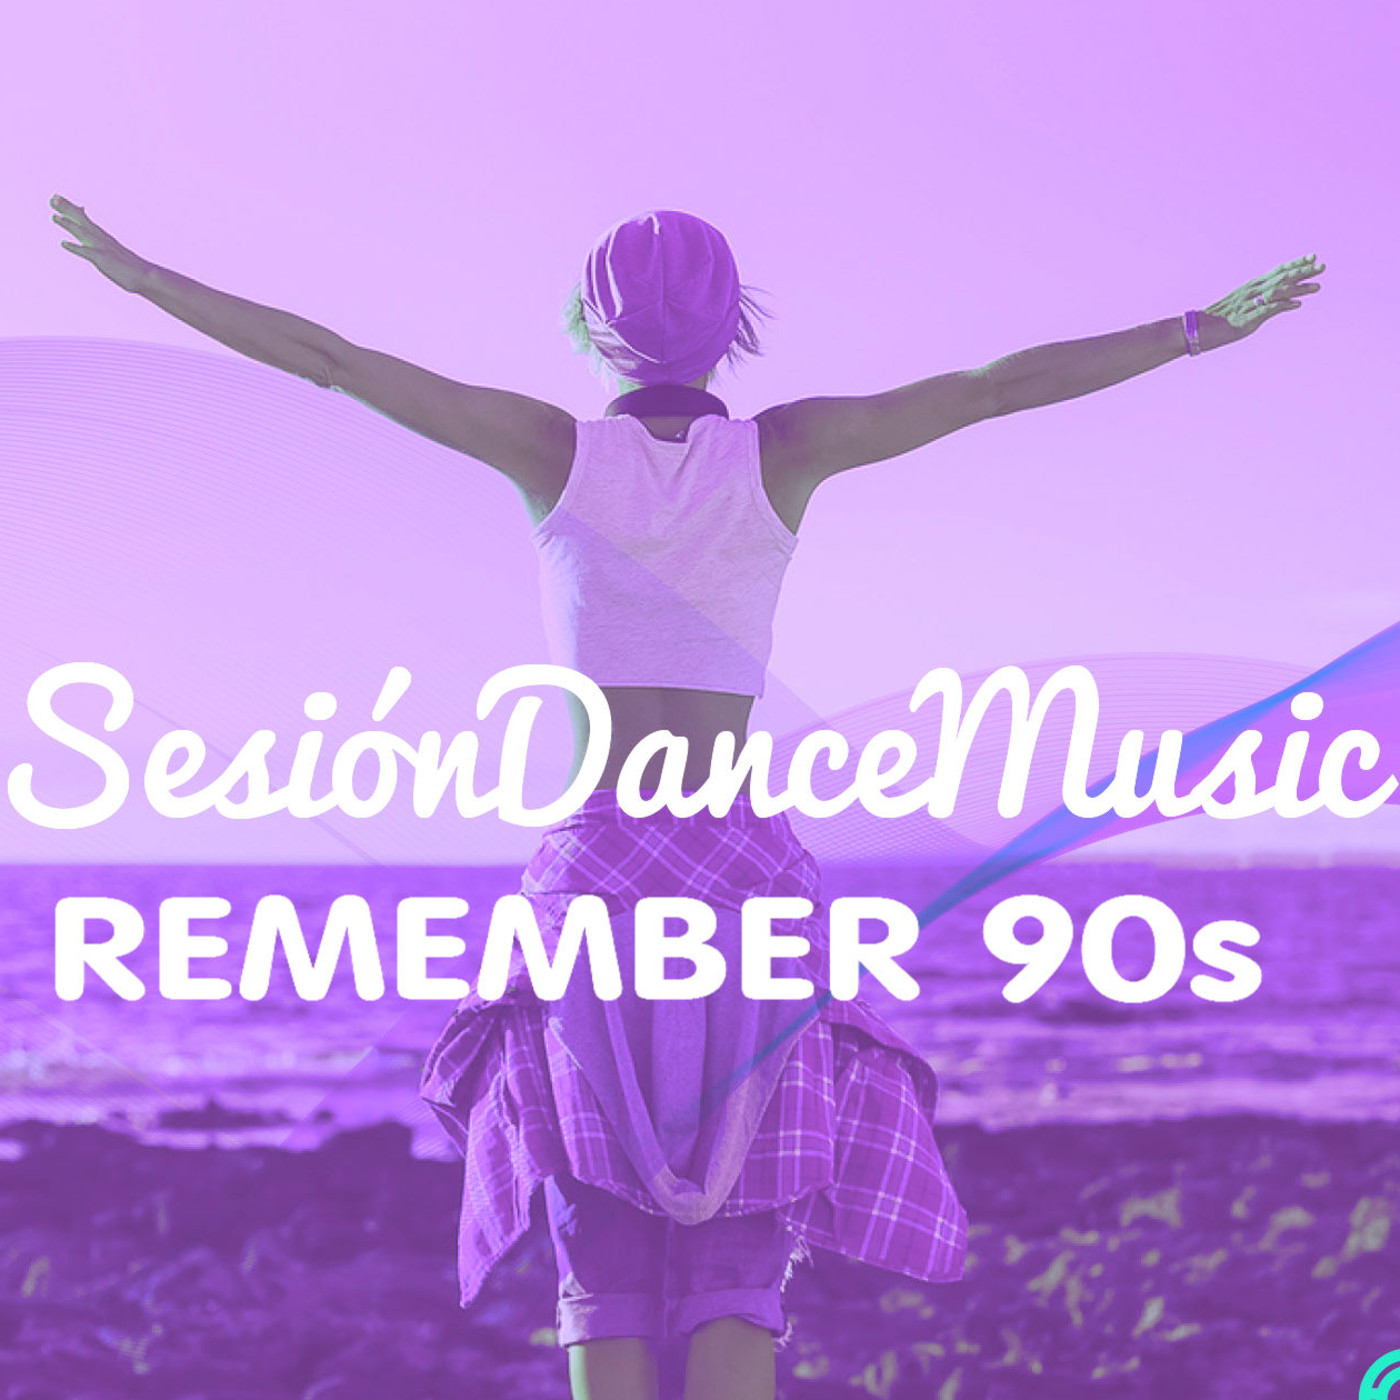 Sesion Dance Music - REMEMBER 90s